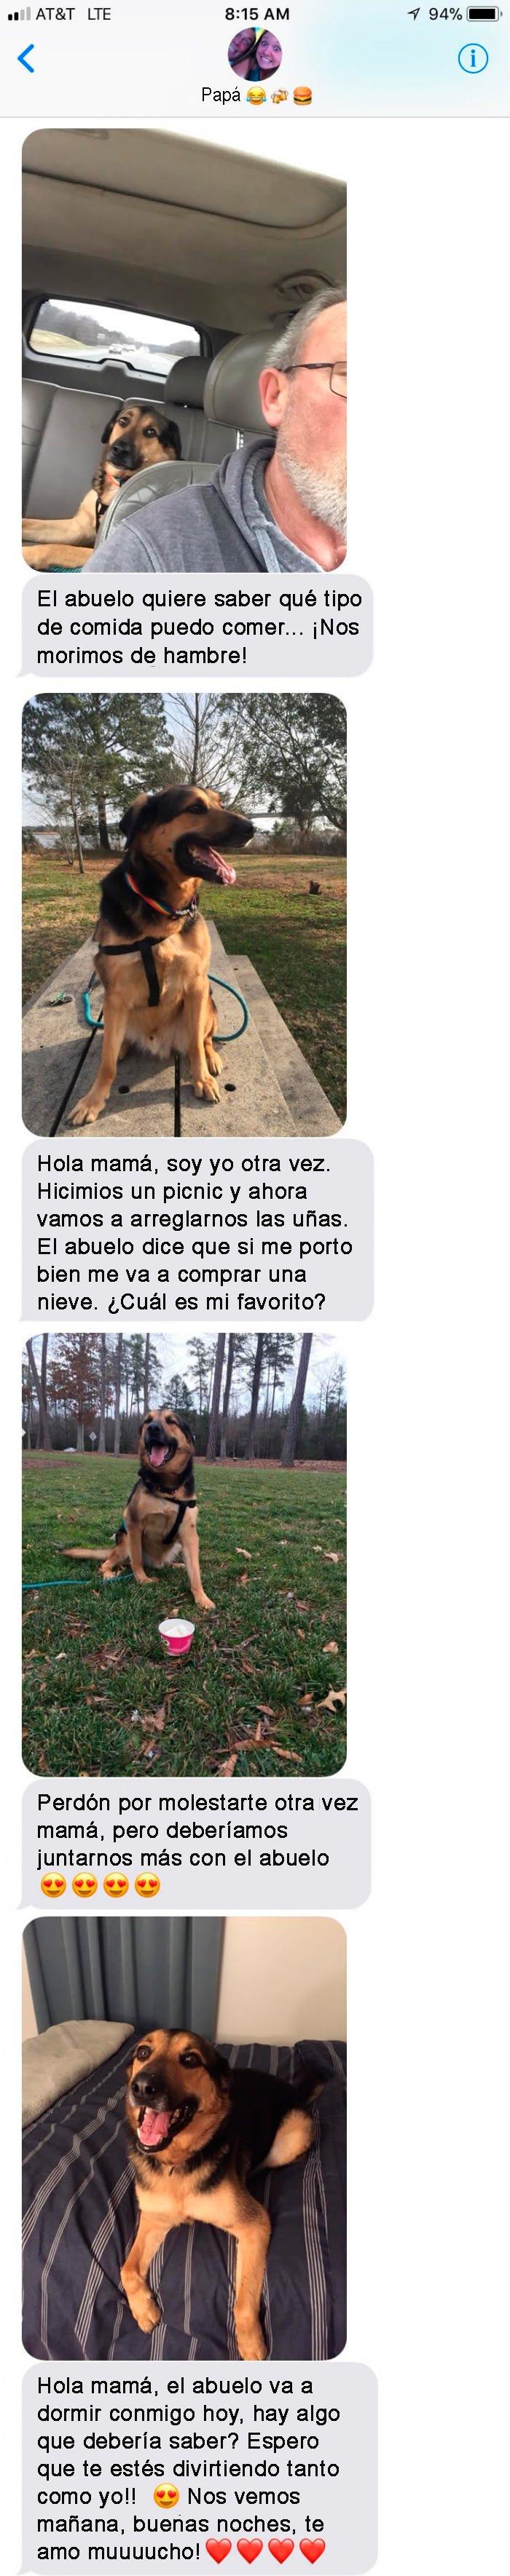 mensajes perro